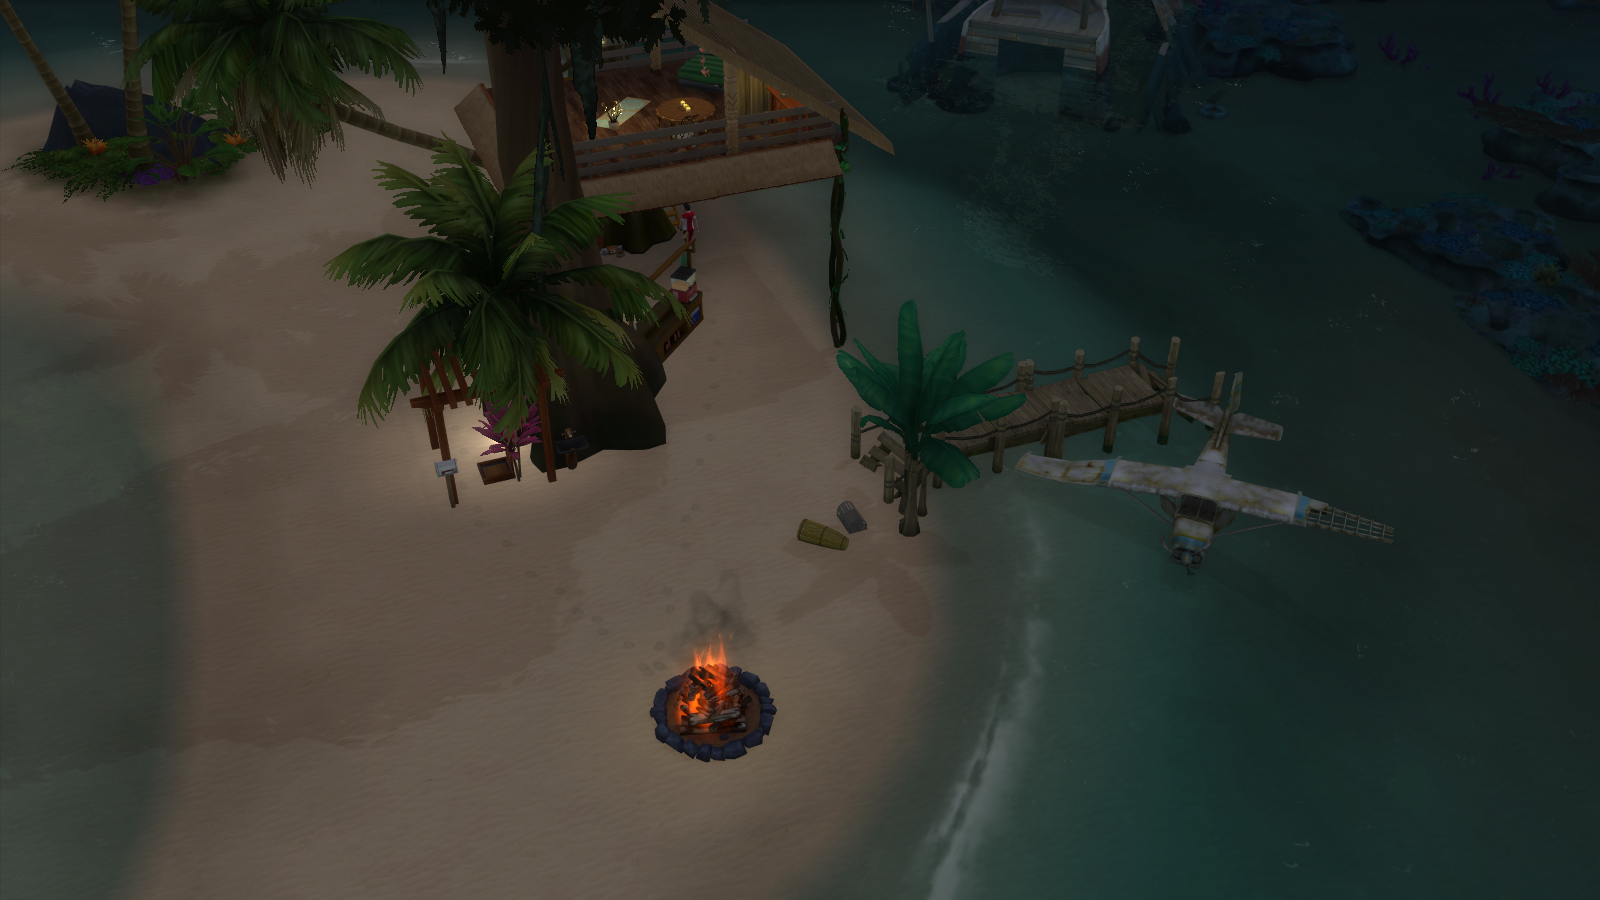 Tree House Sims 4 Island